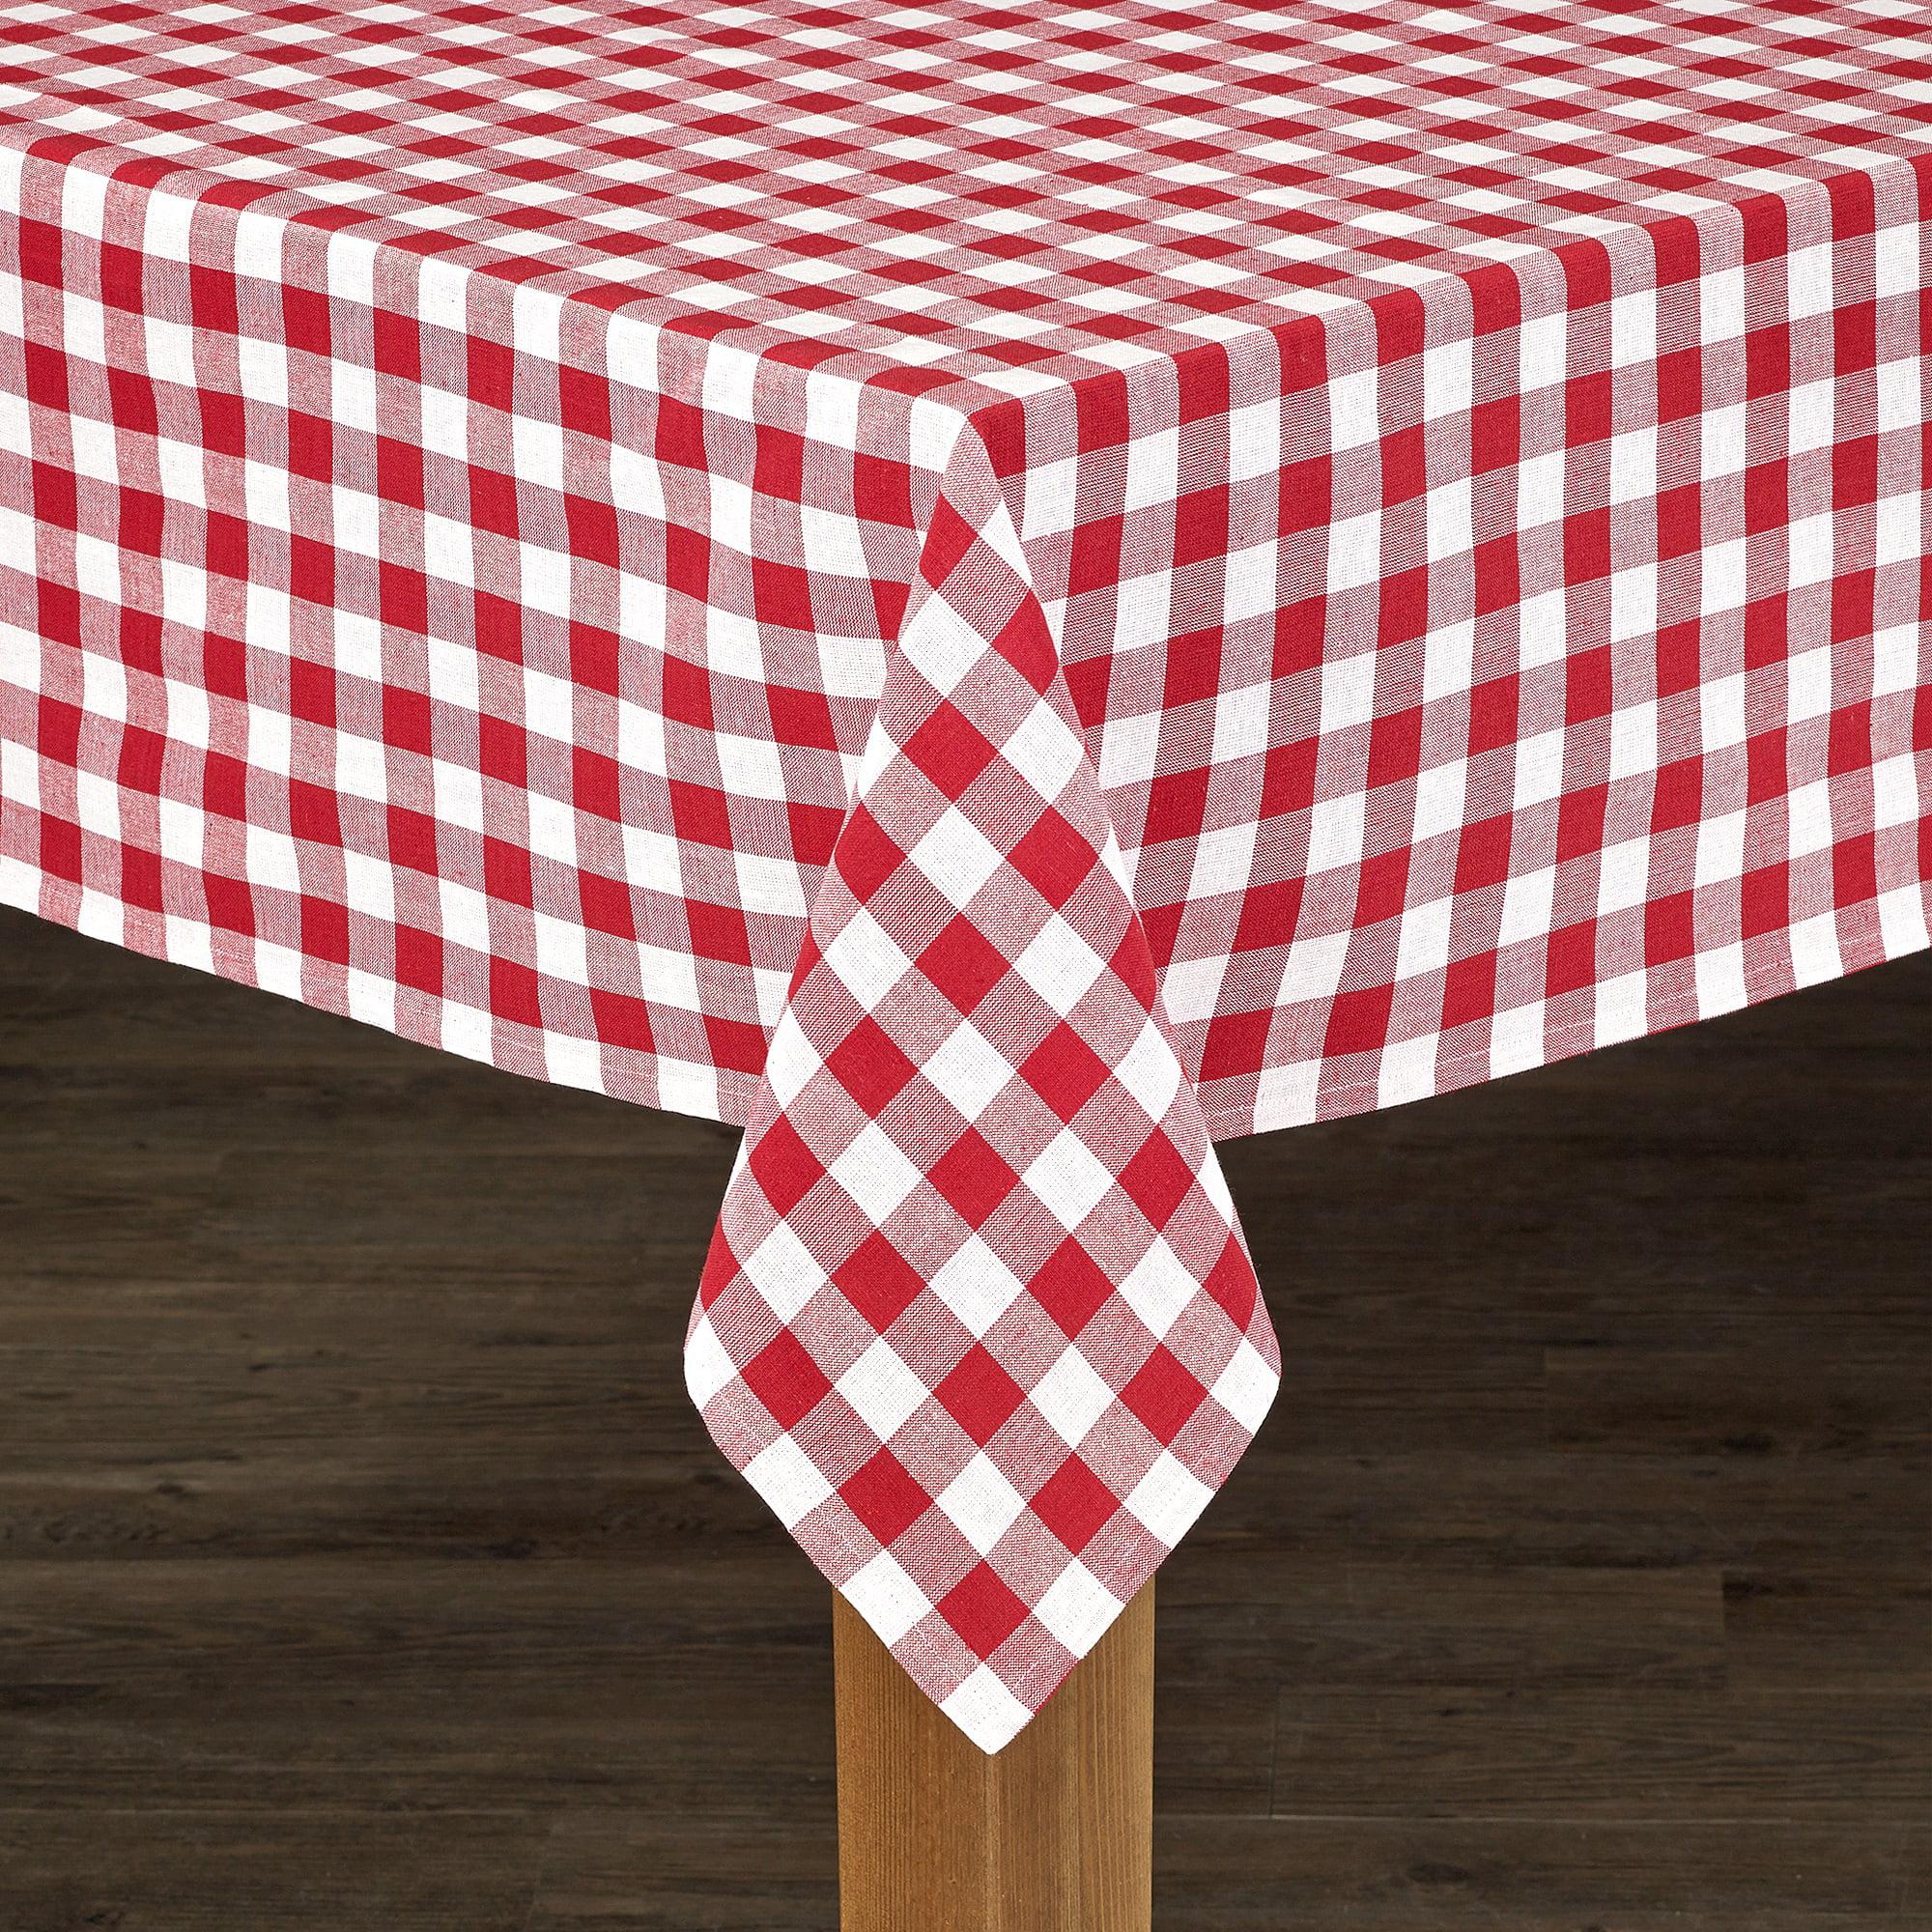 "Red Buffalo Check 100% Cotton Tablecloth 52""X52"" by Lintex Linens"